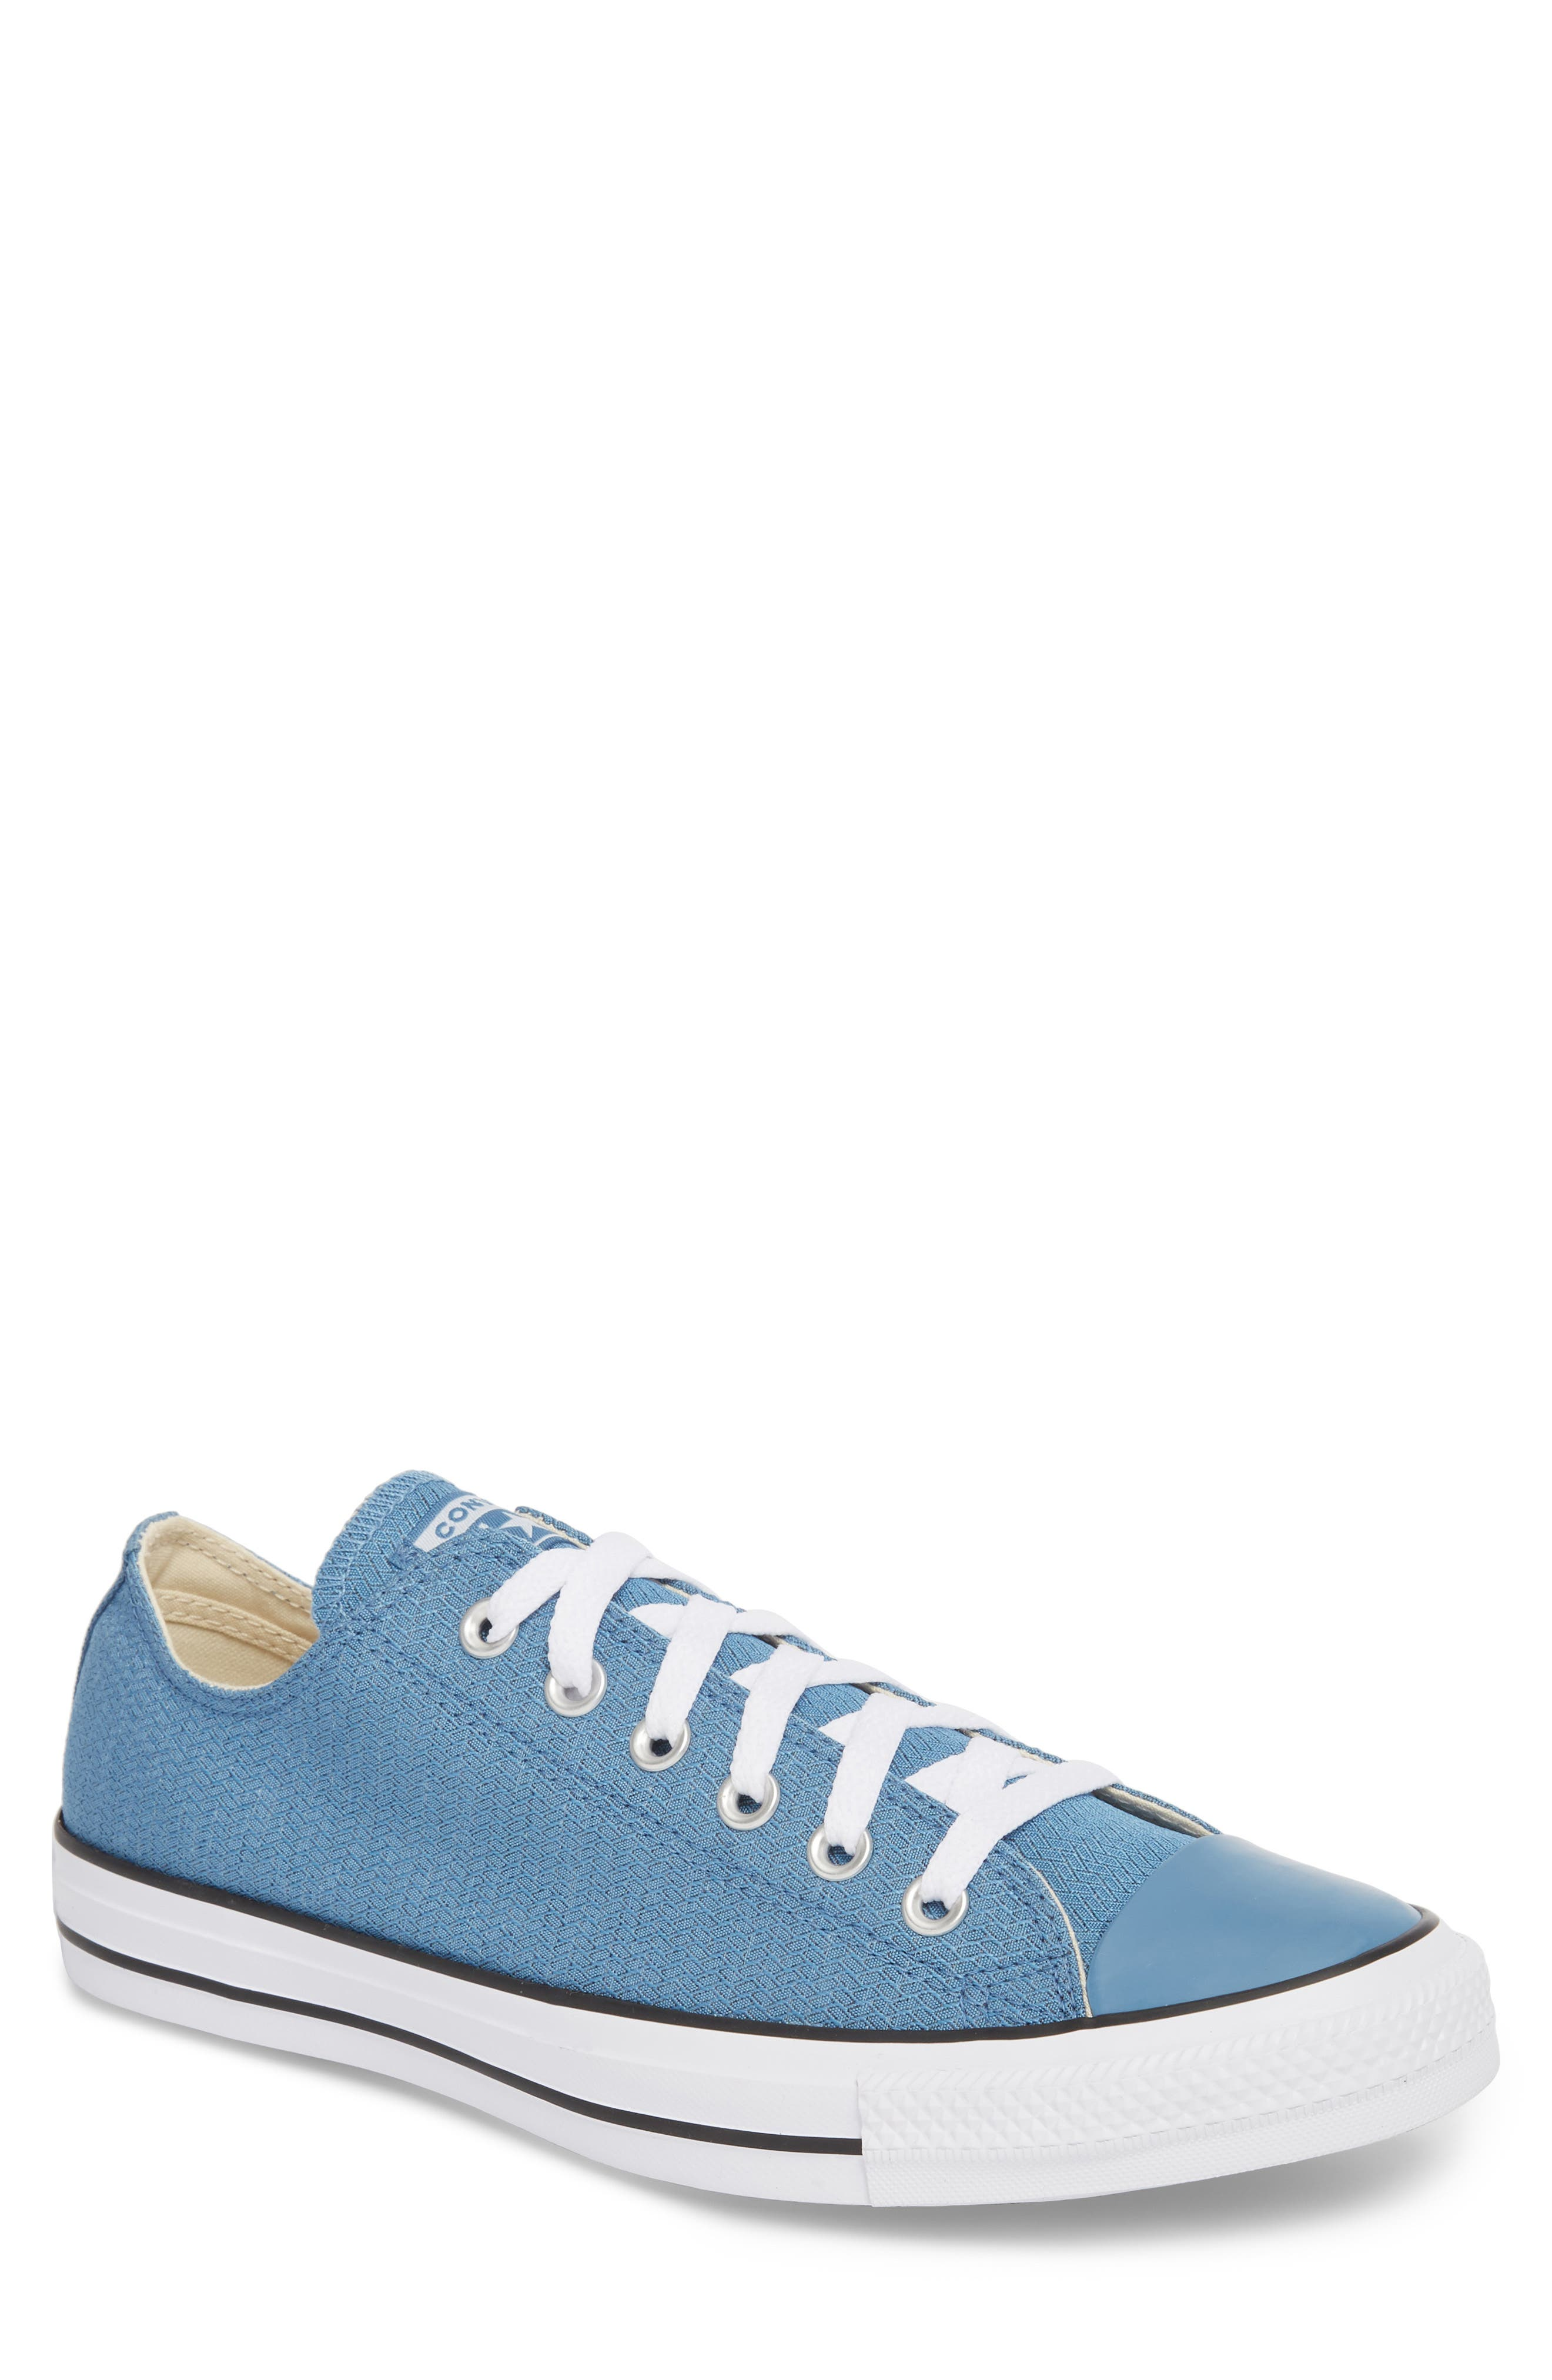 All Star<sup>®</sup> Ripstop Low Top Sneaker,                         Main,                         color, Aegean Storm